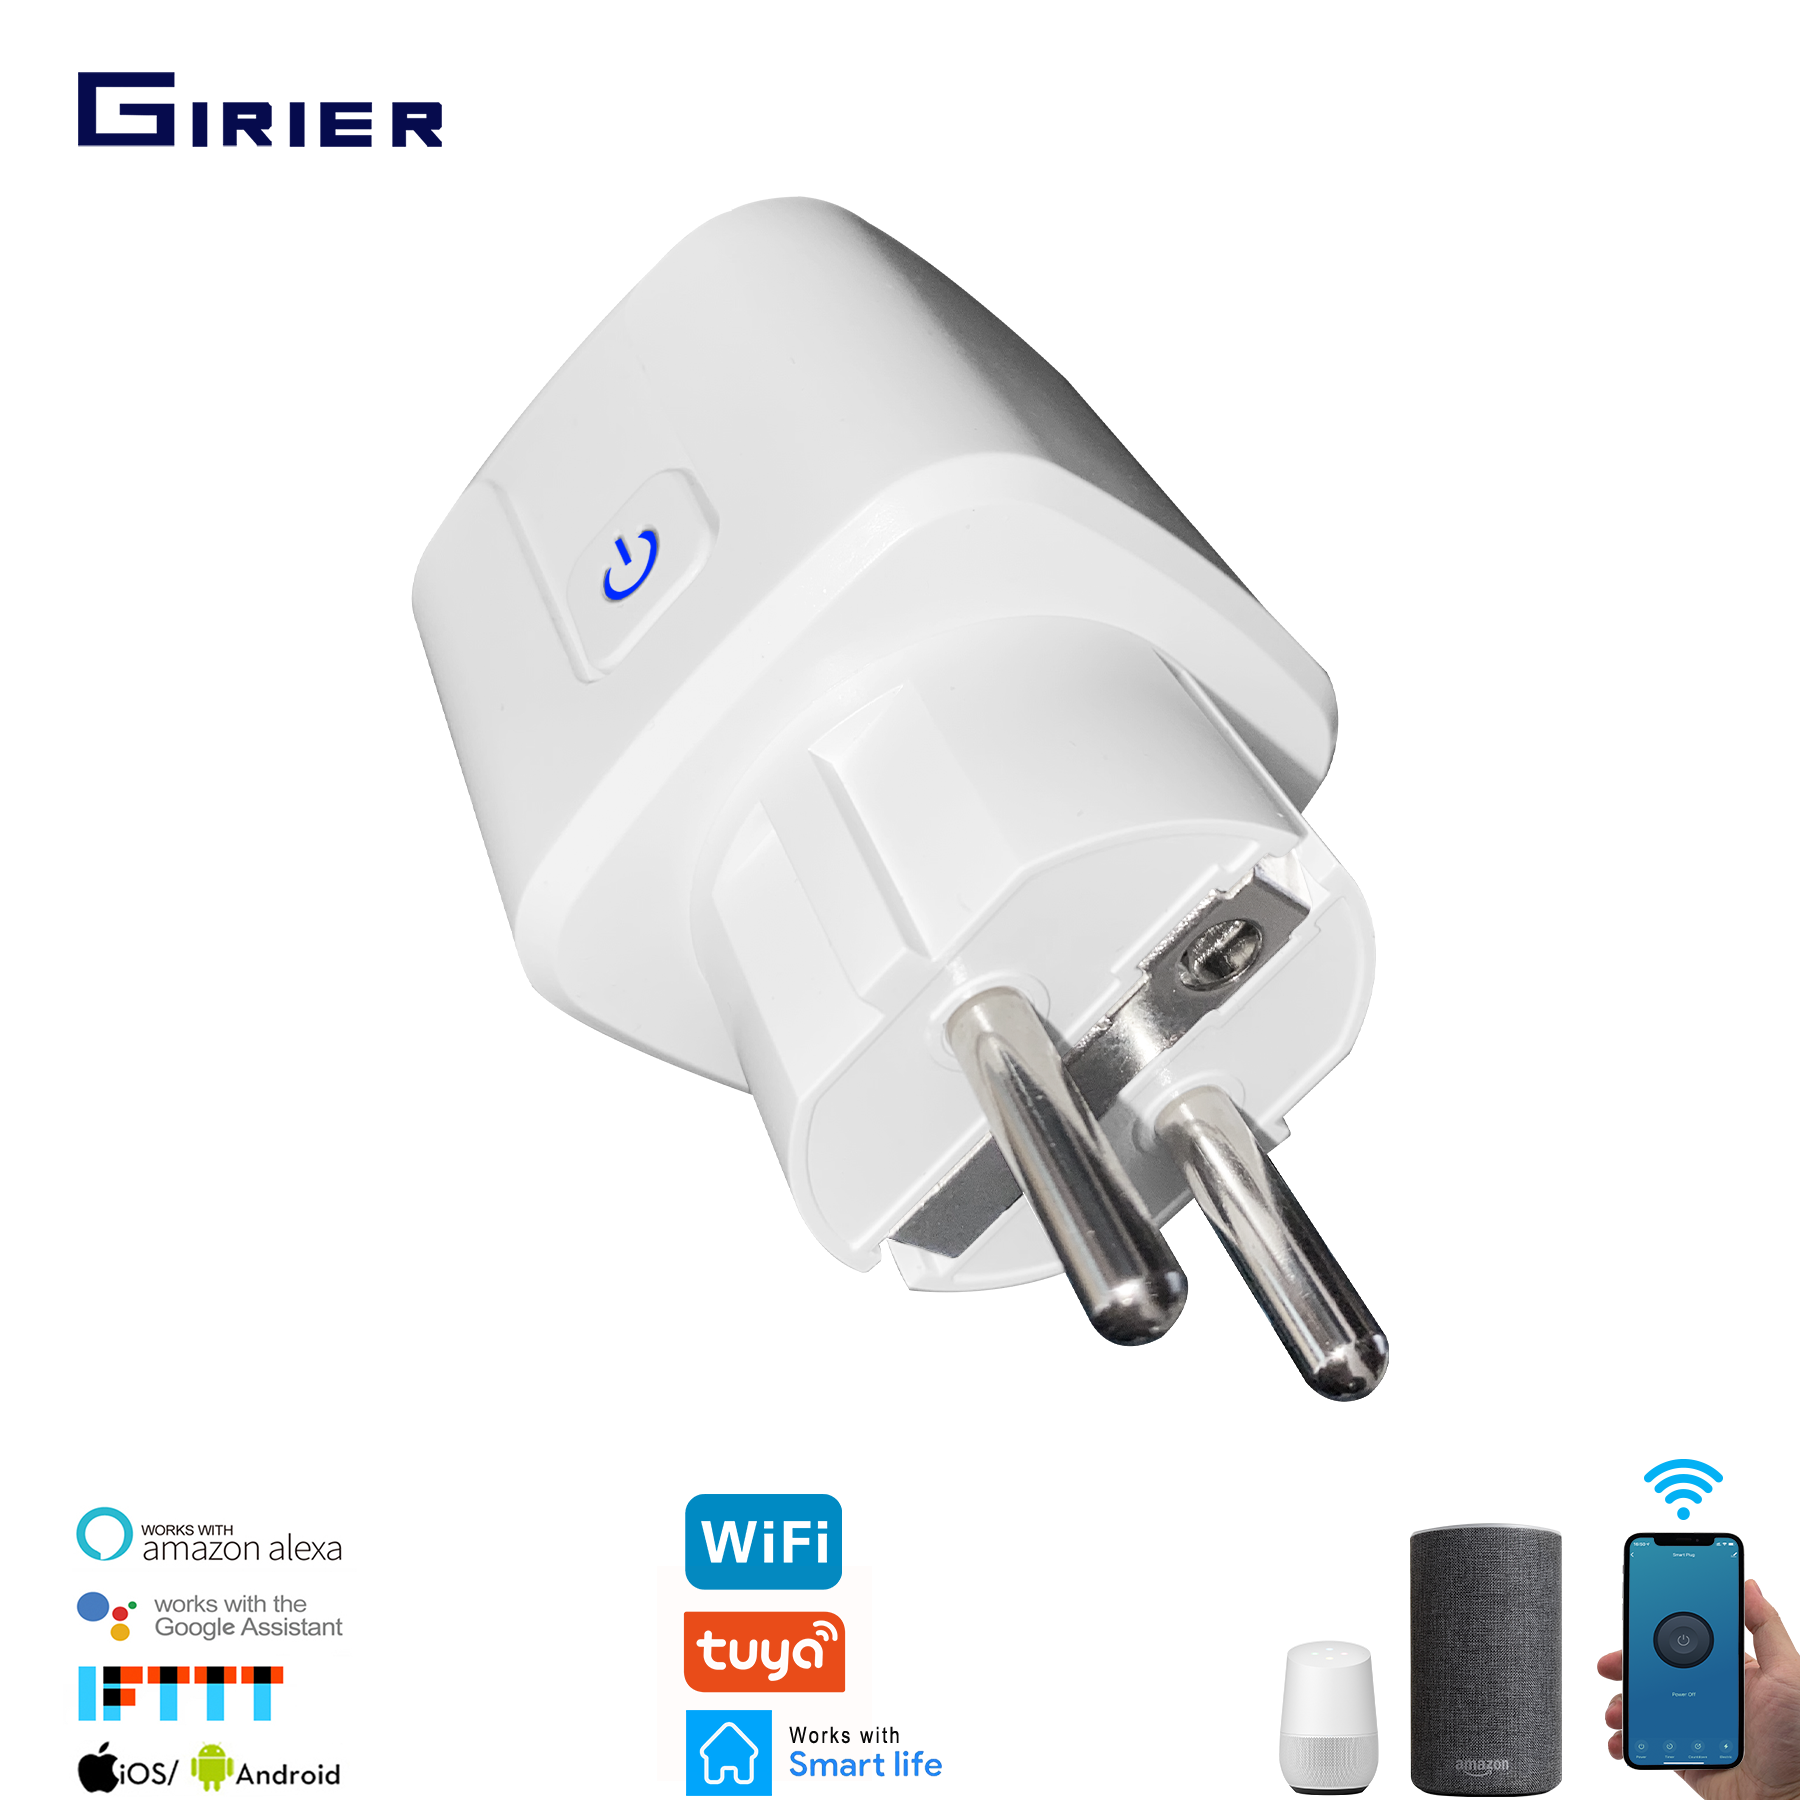 16A EU Smart Wifi Power Plug With Power Monitor, Smart Home Wifi Wireless Socket Outlet, Works With Alexa Google Home Tuya App